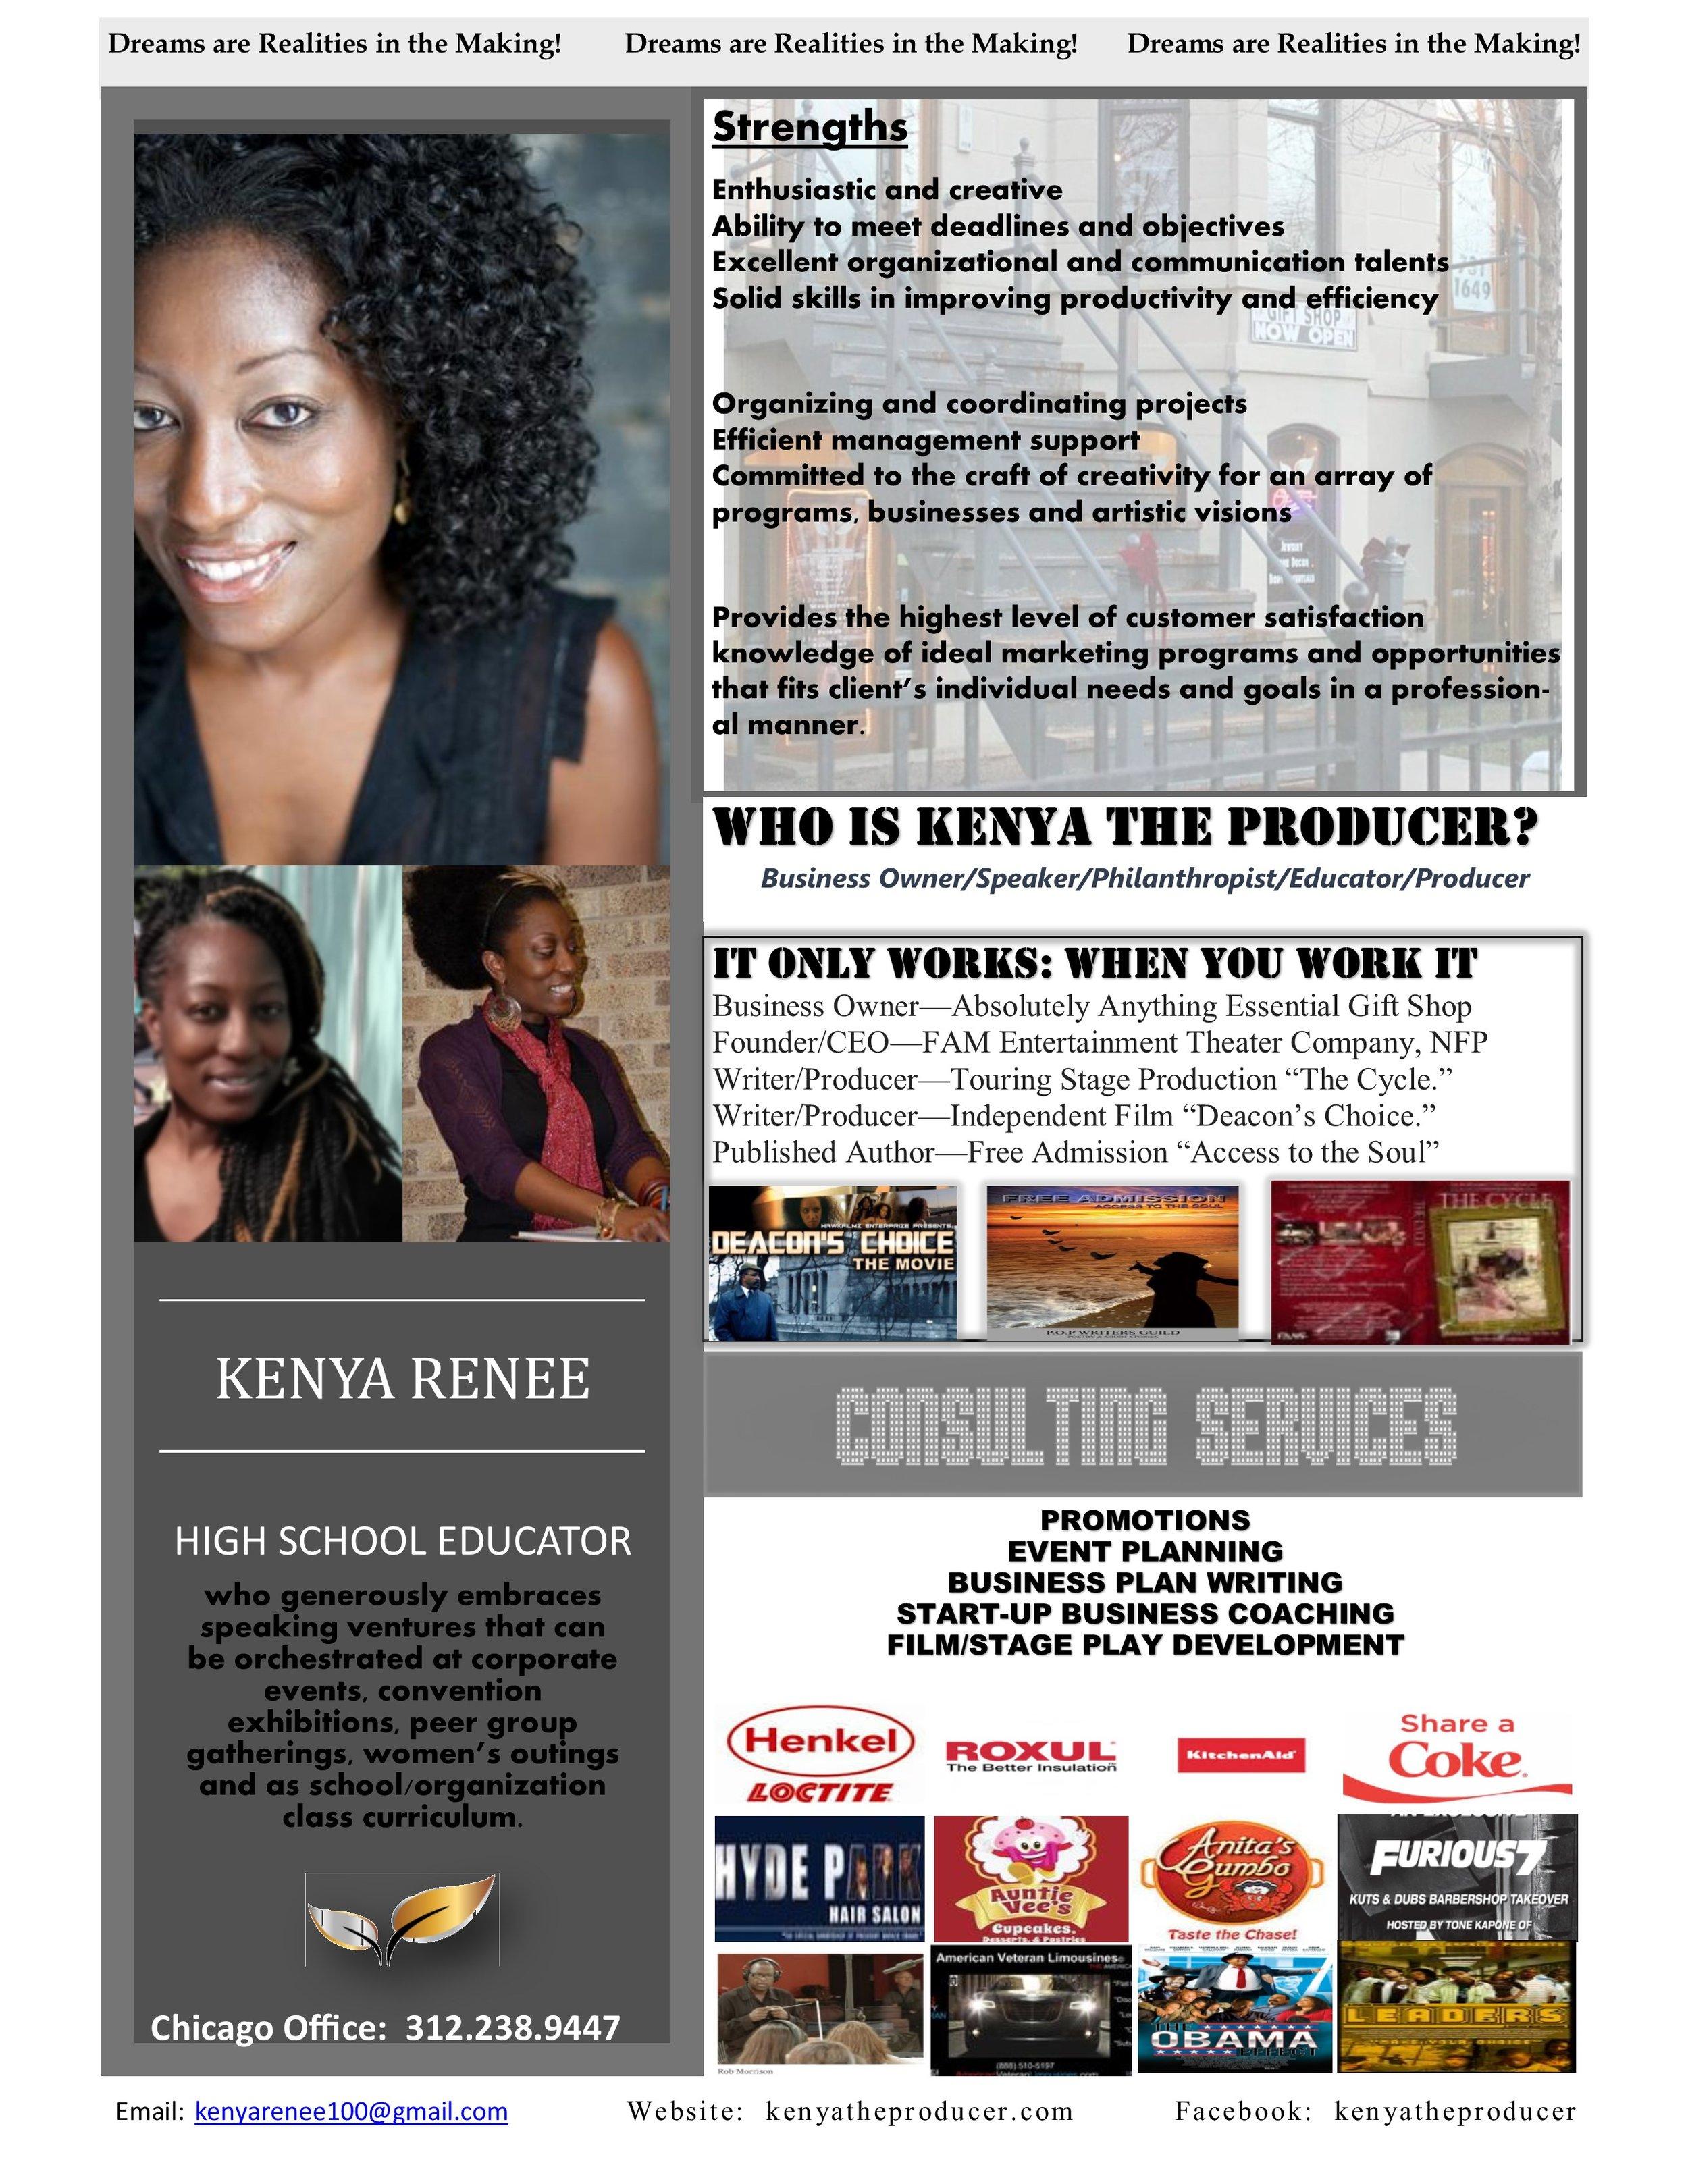 Hire Kenya Renee